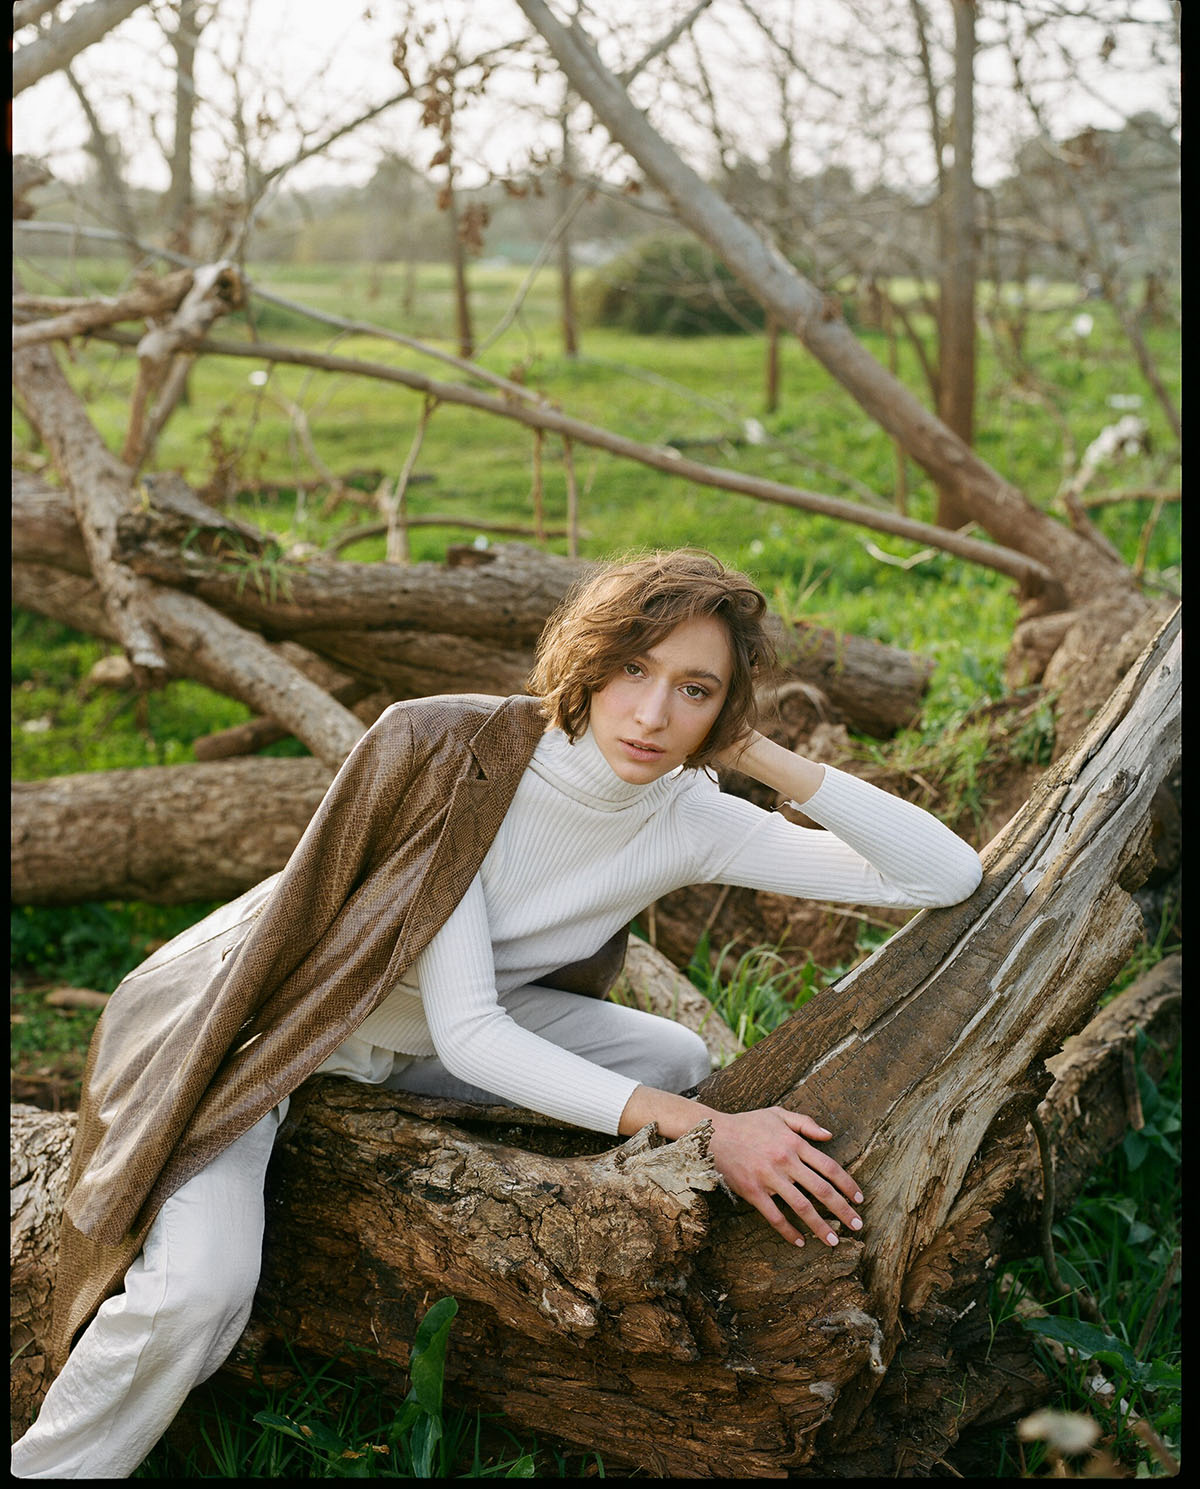 Shirt  Gong  Pants  Adva Aharon  Jacket  Zara  Shoes  Scoop